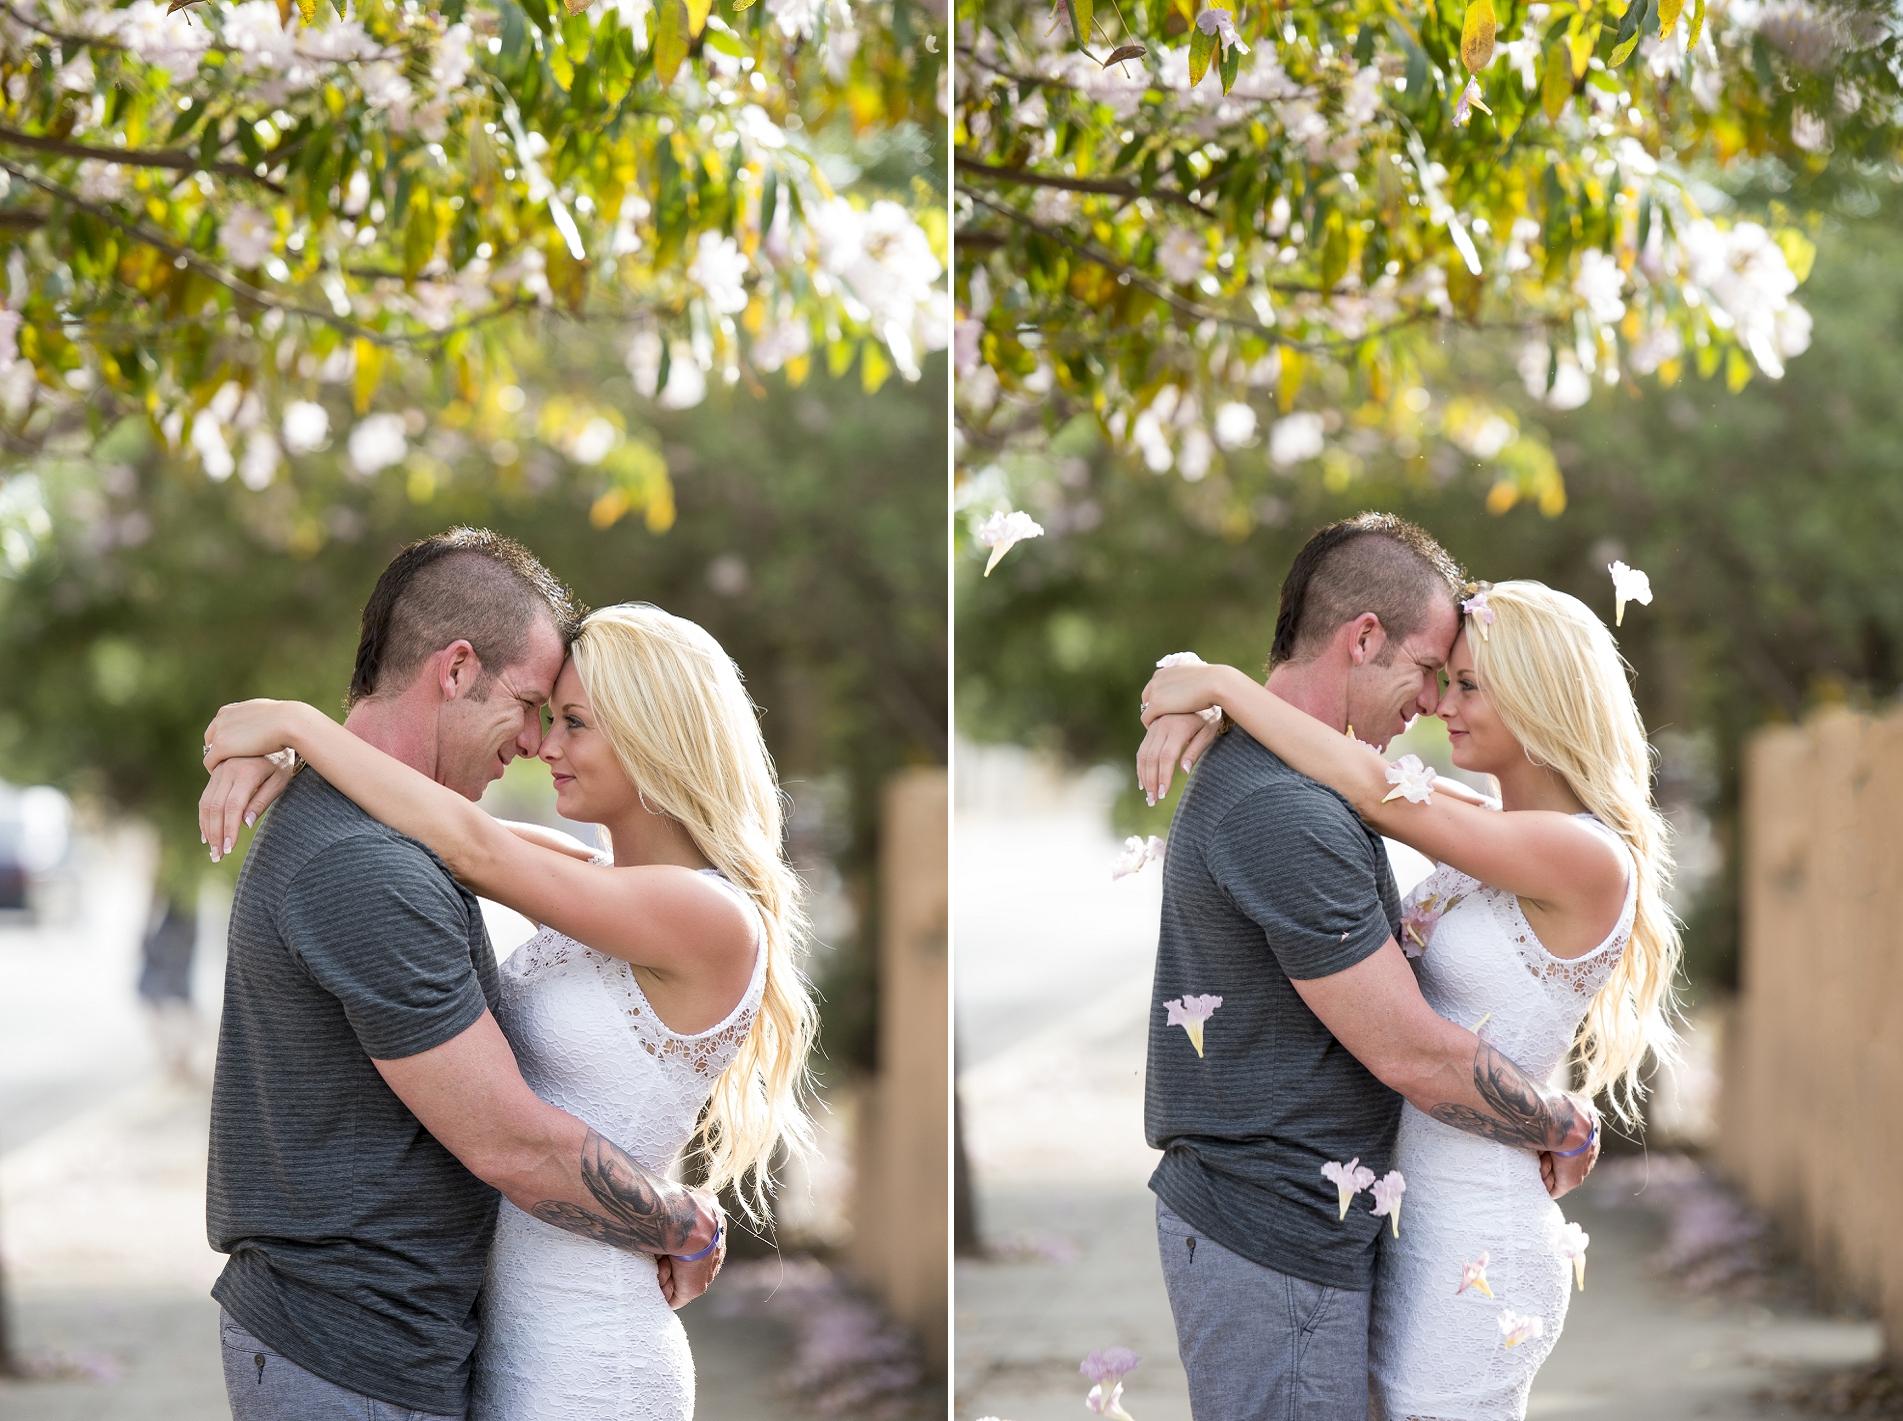 Best Engagement Photos Ever Cuba-engagement-session-2807.jpg: galleryhip.com/best-engagement-photos-ever.html